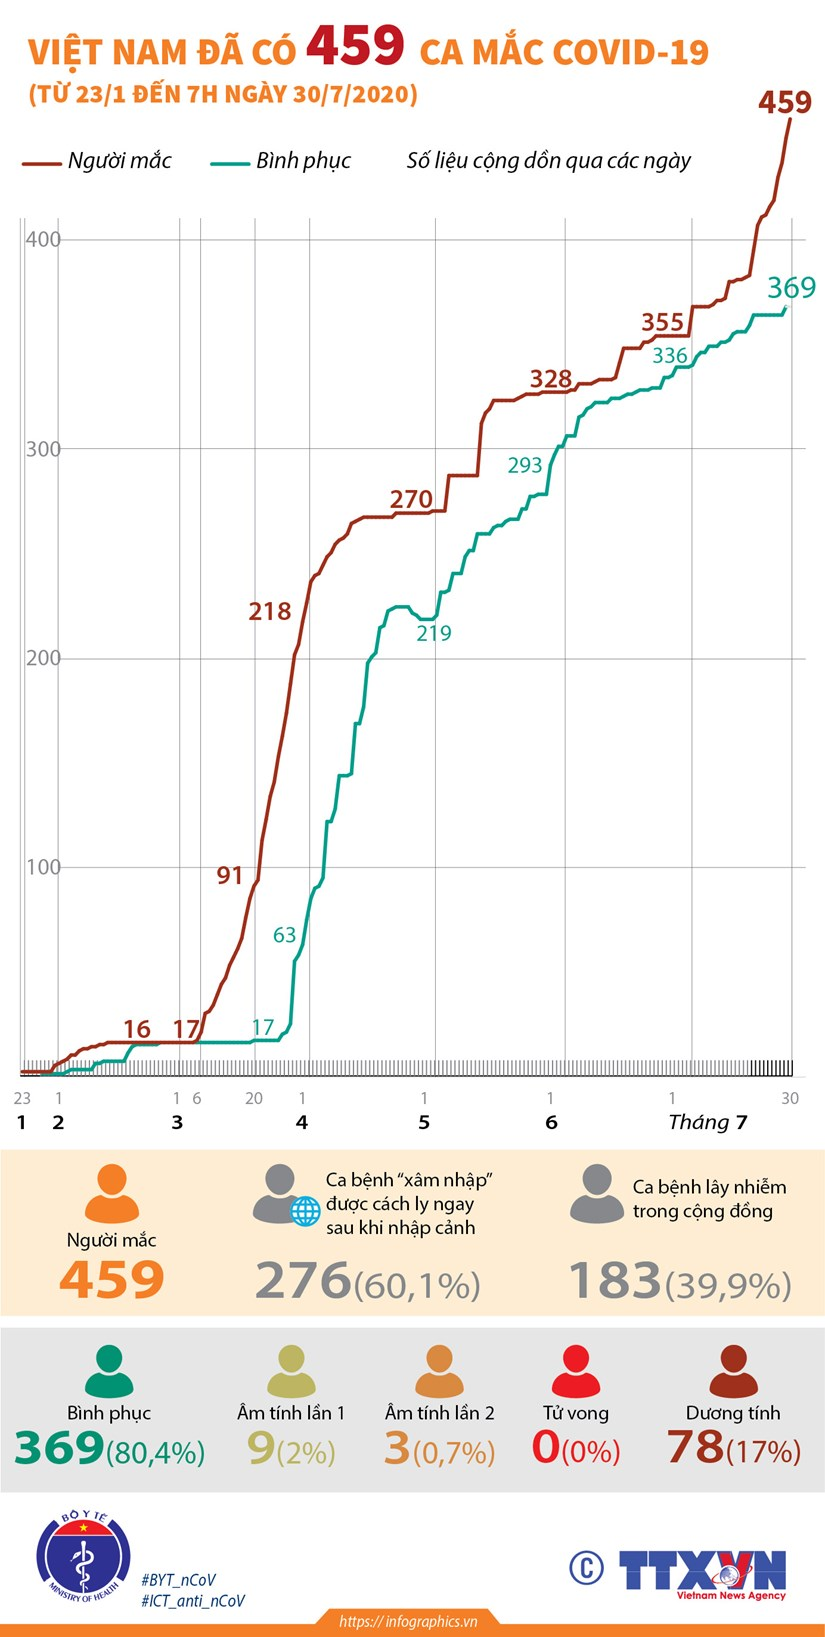 [Infographics] Viet Nam da ghi nhan 459 ca mac COVID-19 hinh anh 1